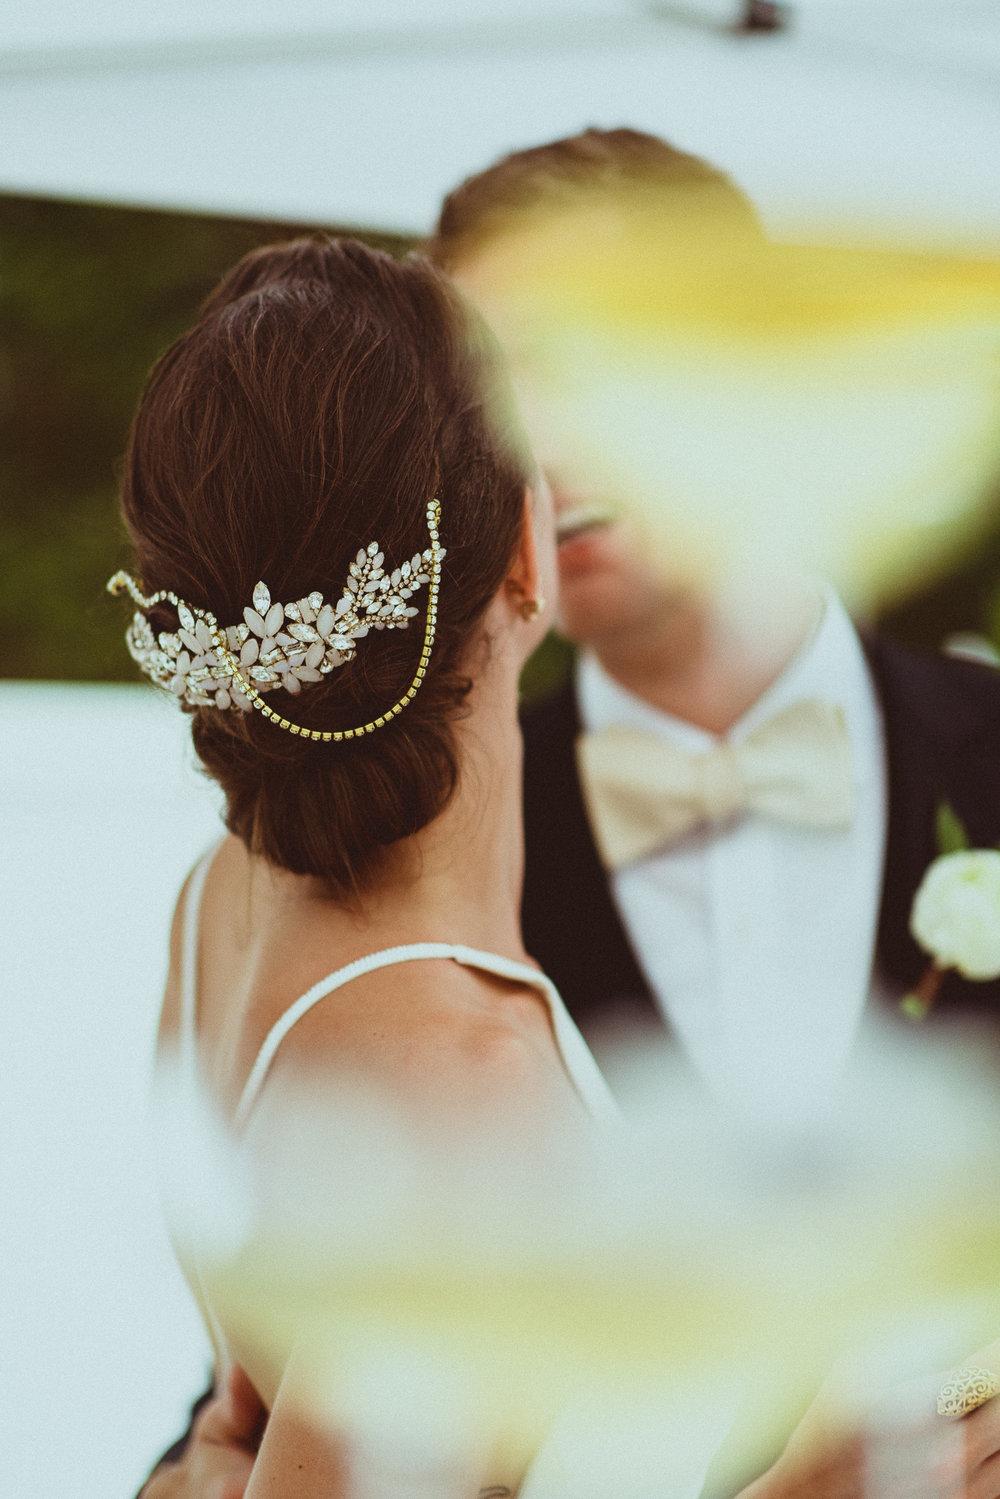 BEST_CHICAG_WEDDING_PHOTOGRAPHER_ZOE_RAIN_-90.jpg